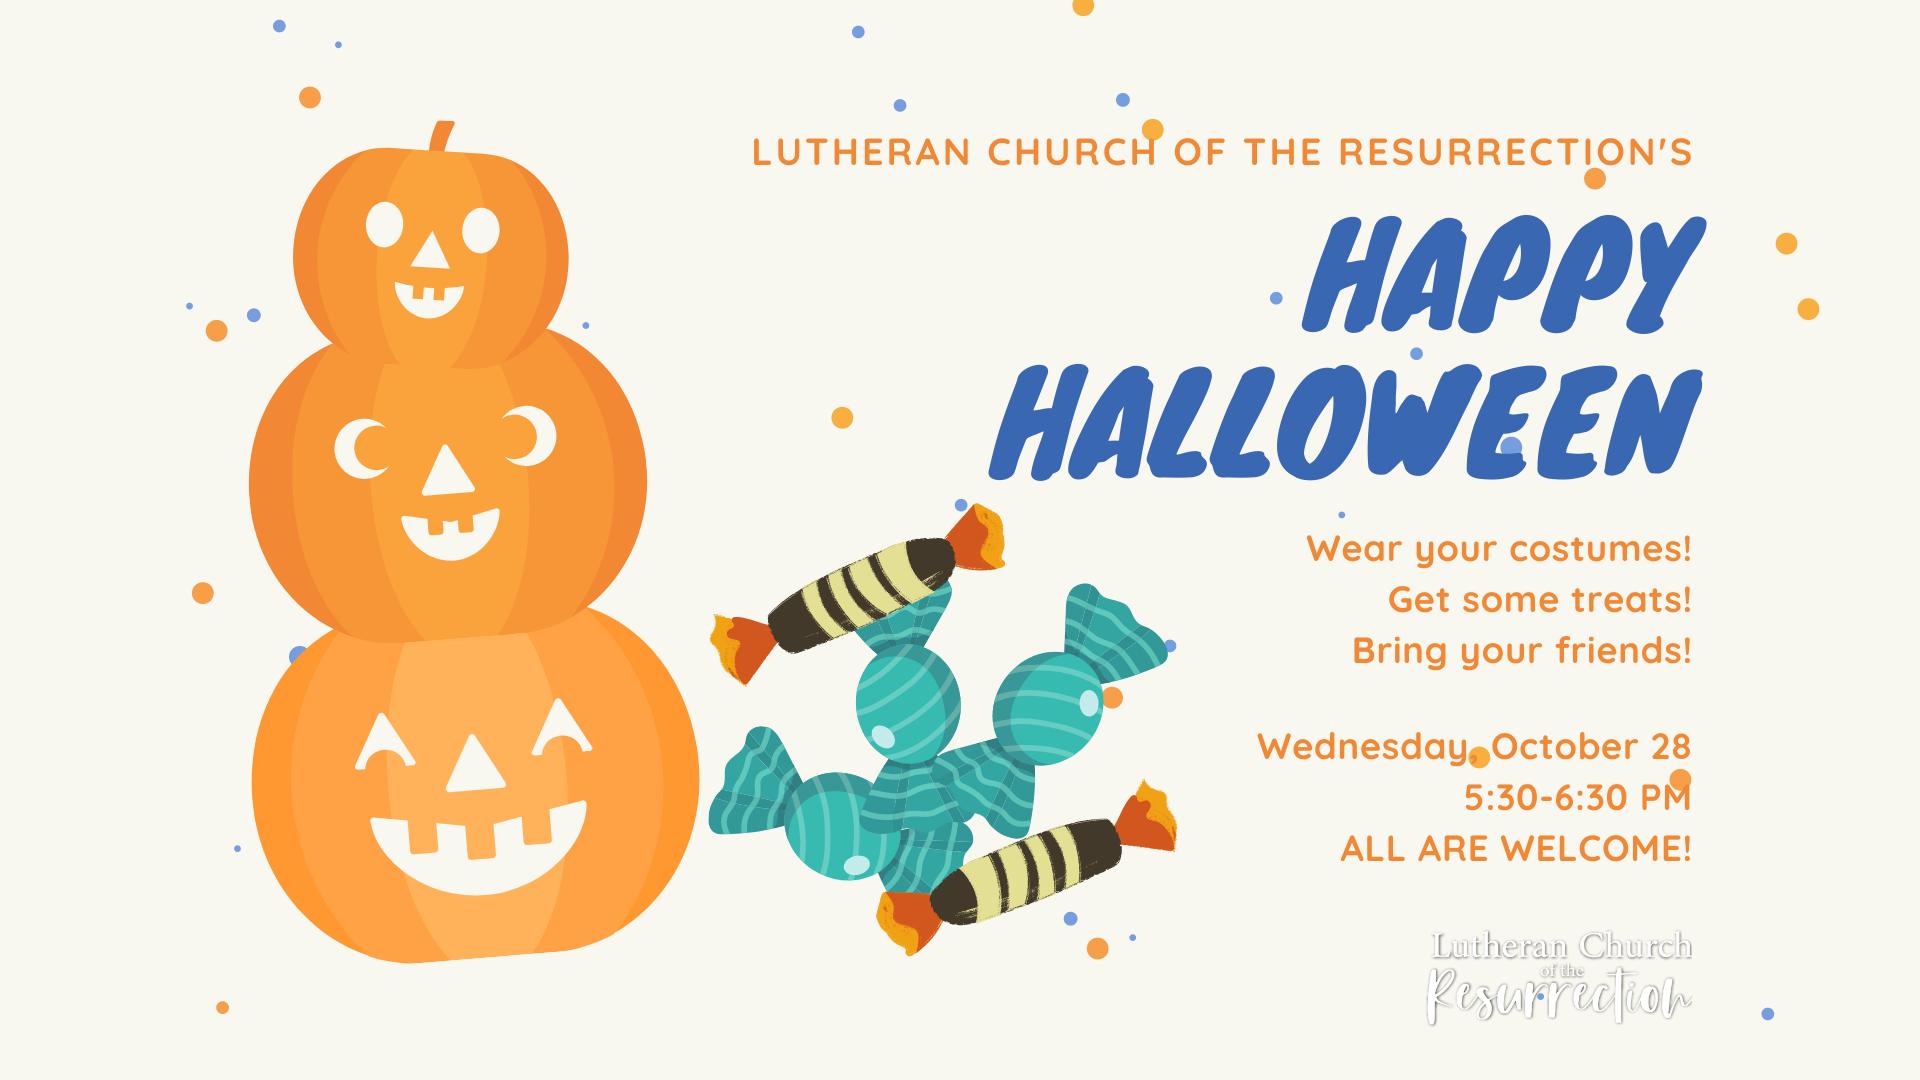 Halloween 2020 Resurrection Church LCR's Happy Halloween!   Hoopla